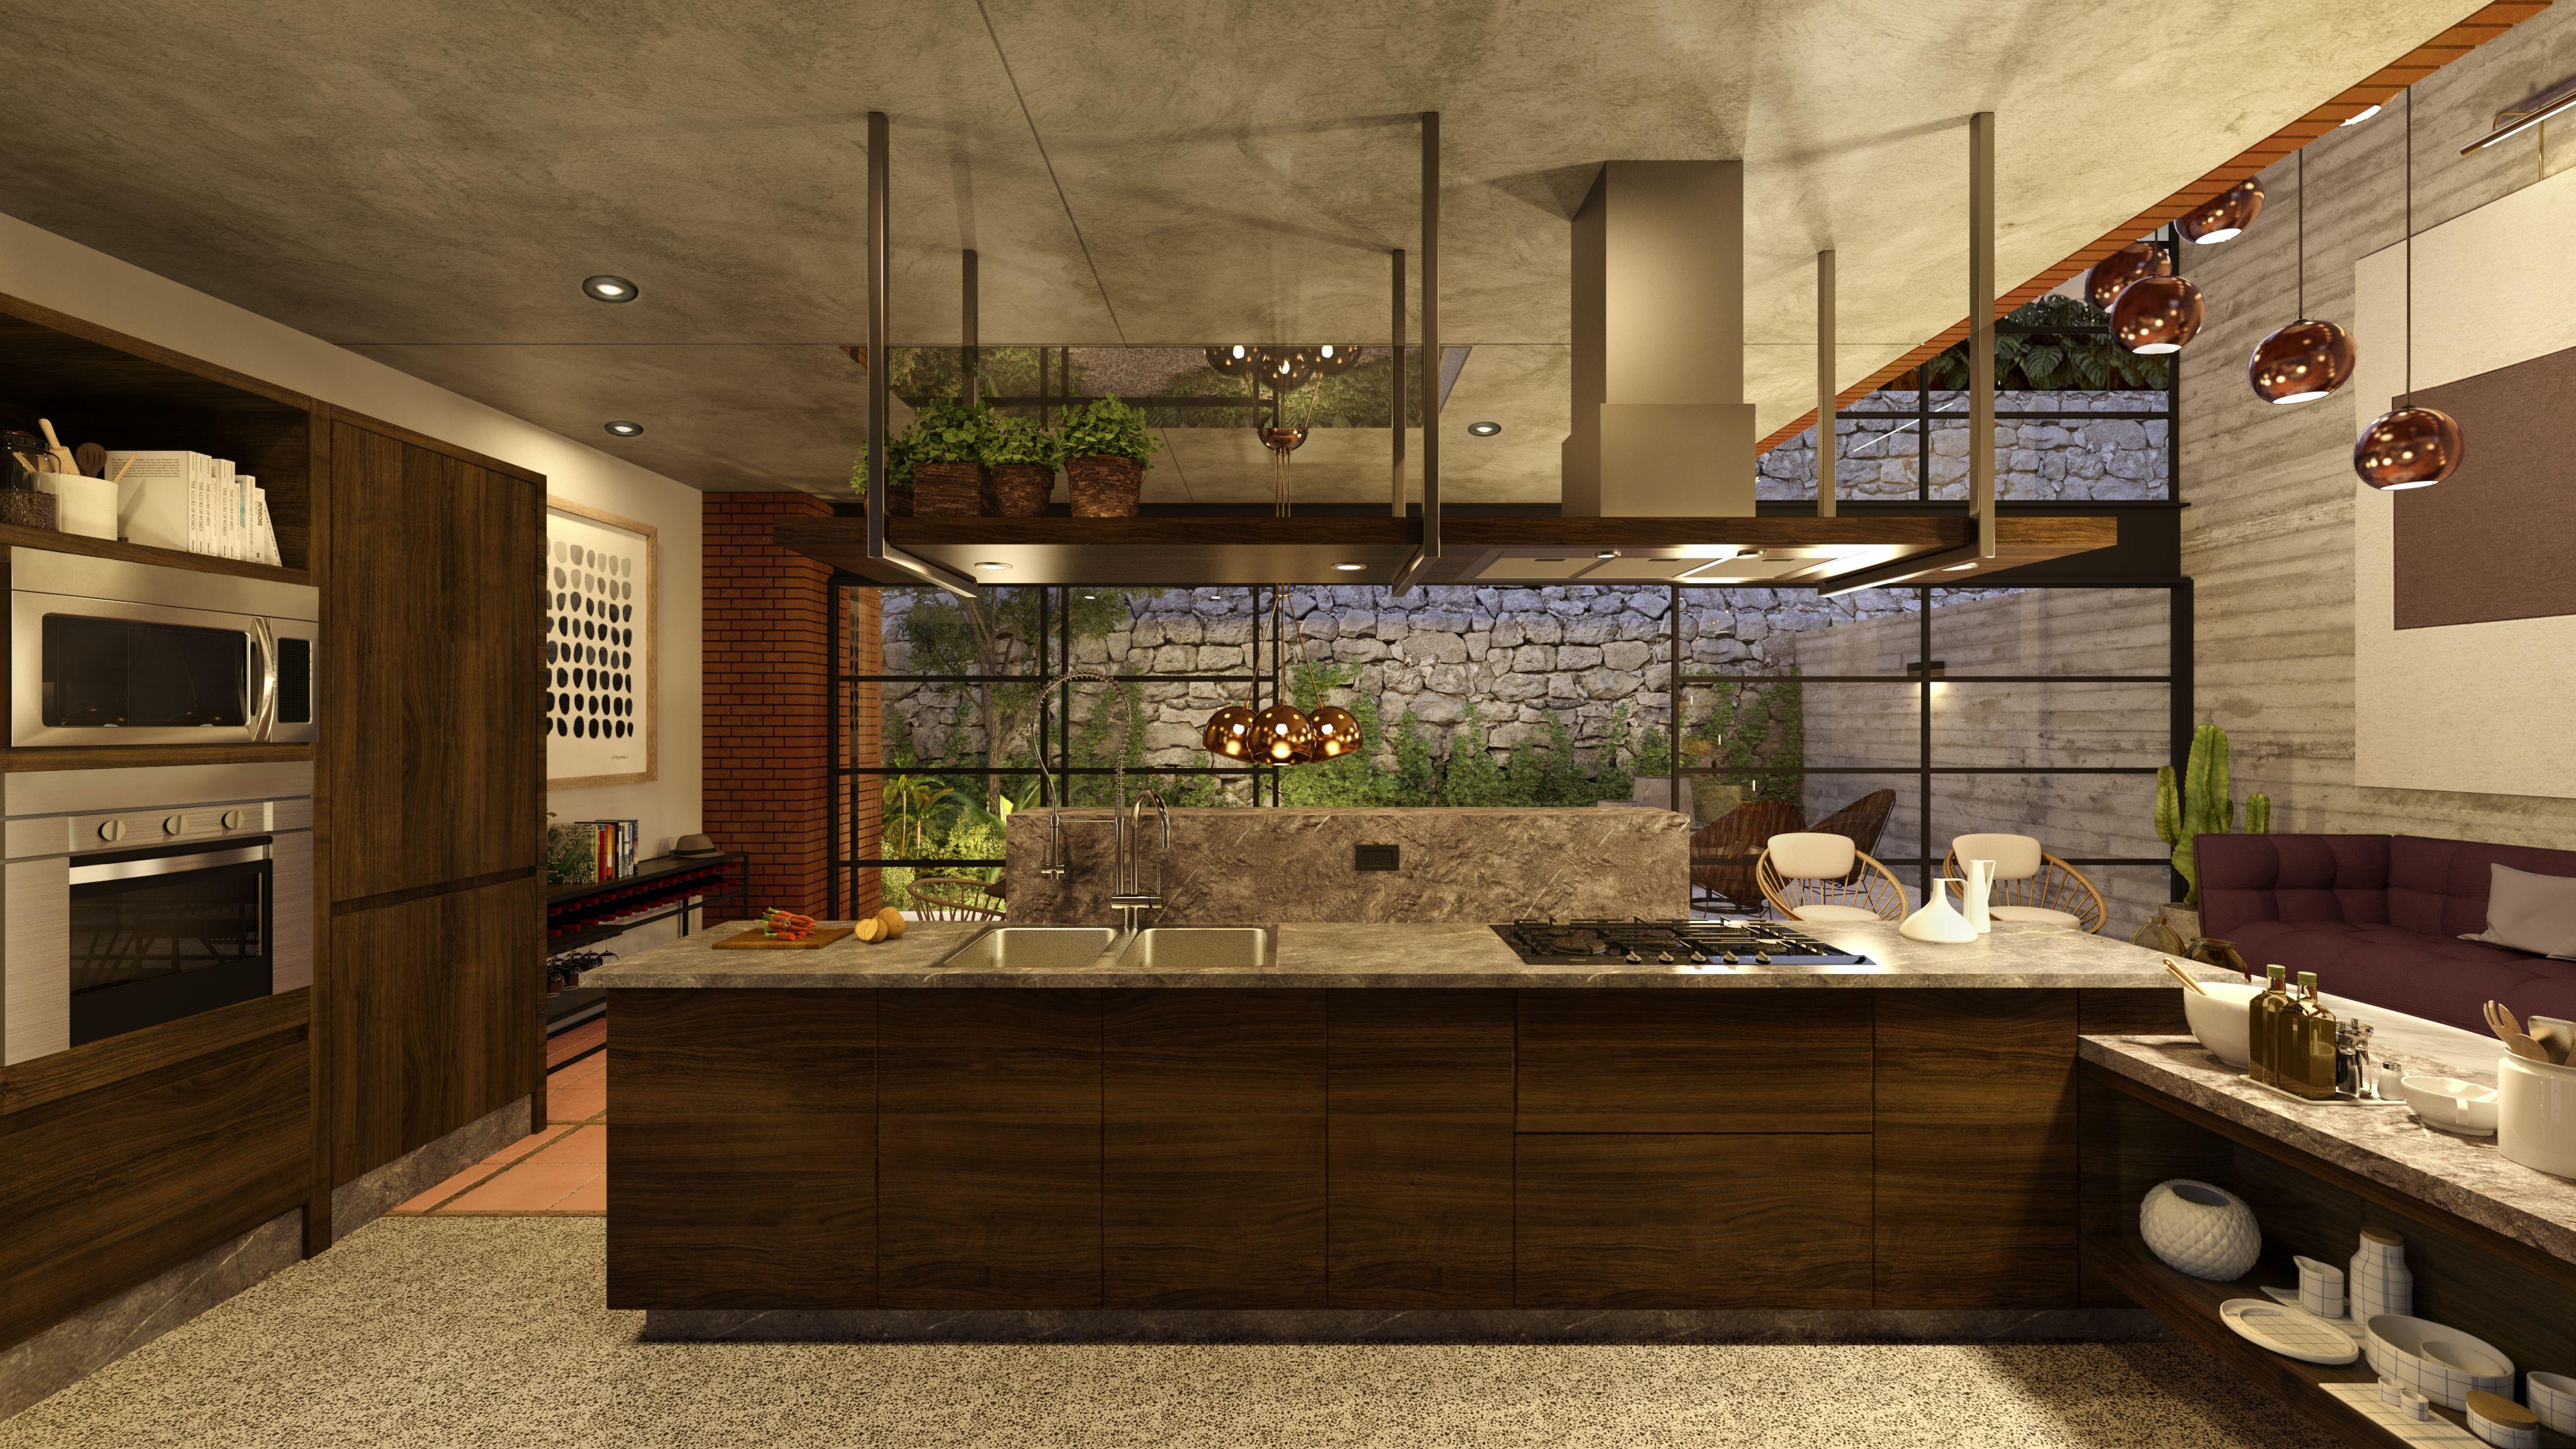 Moderna cocina integral equipada con barra de granito - Campanas de cocina rusticas ...